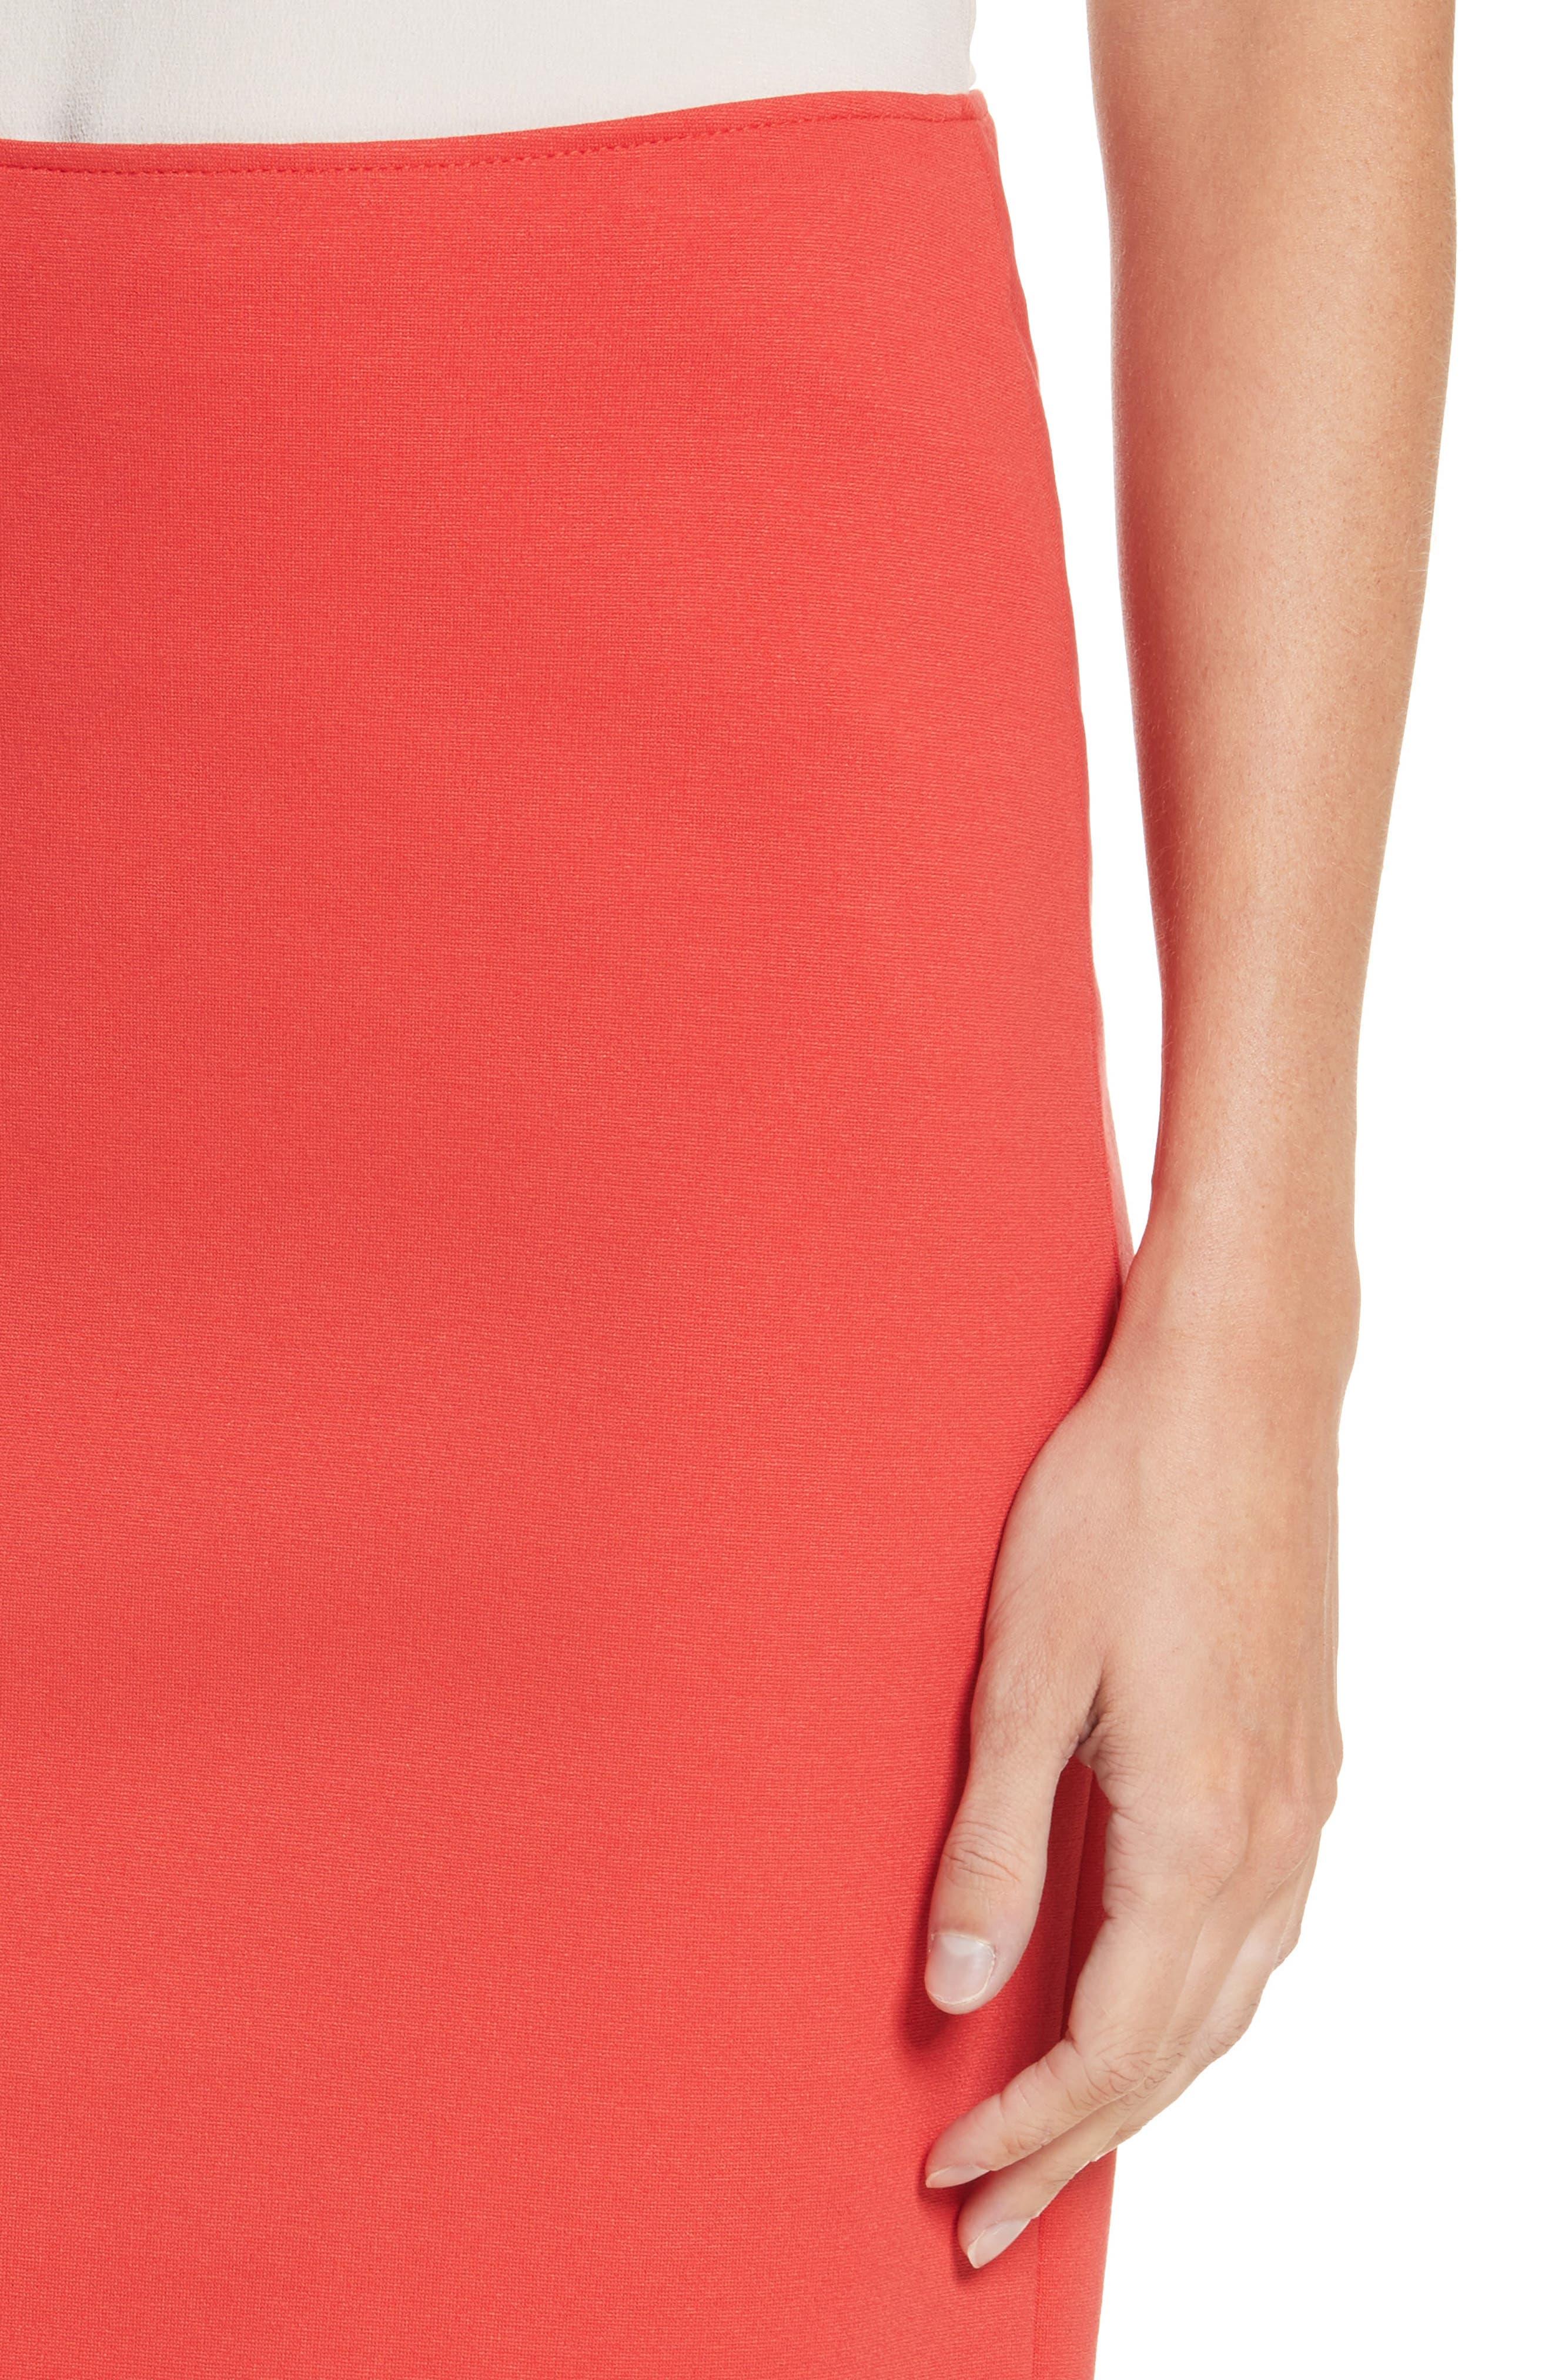 Milano Jersey Pencil Skirt,                             Alternate thumbnail 4, color,                             Solid Bright Orange